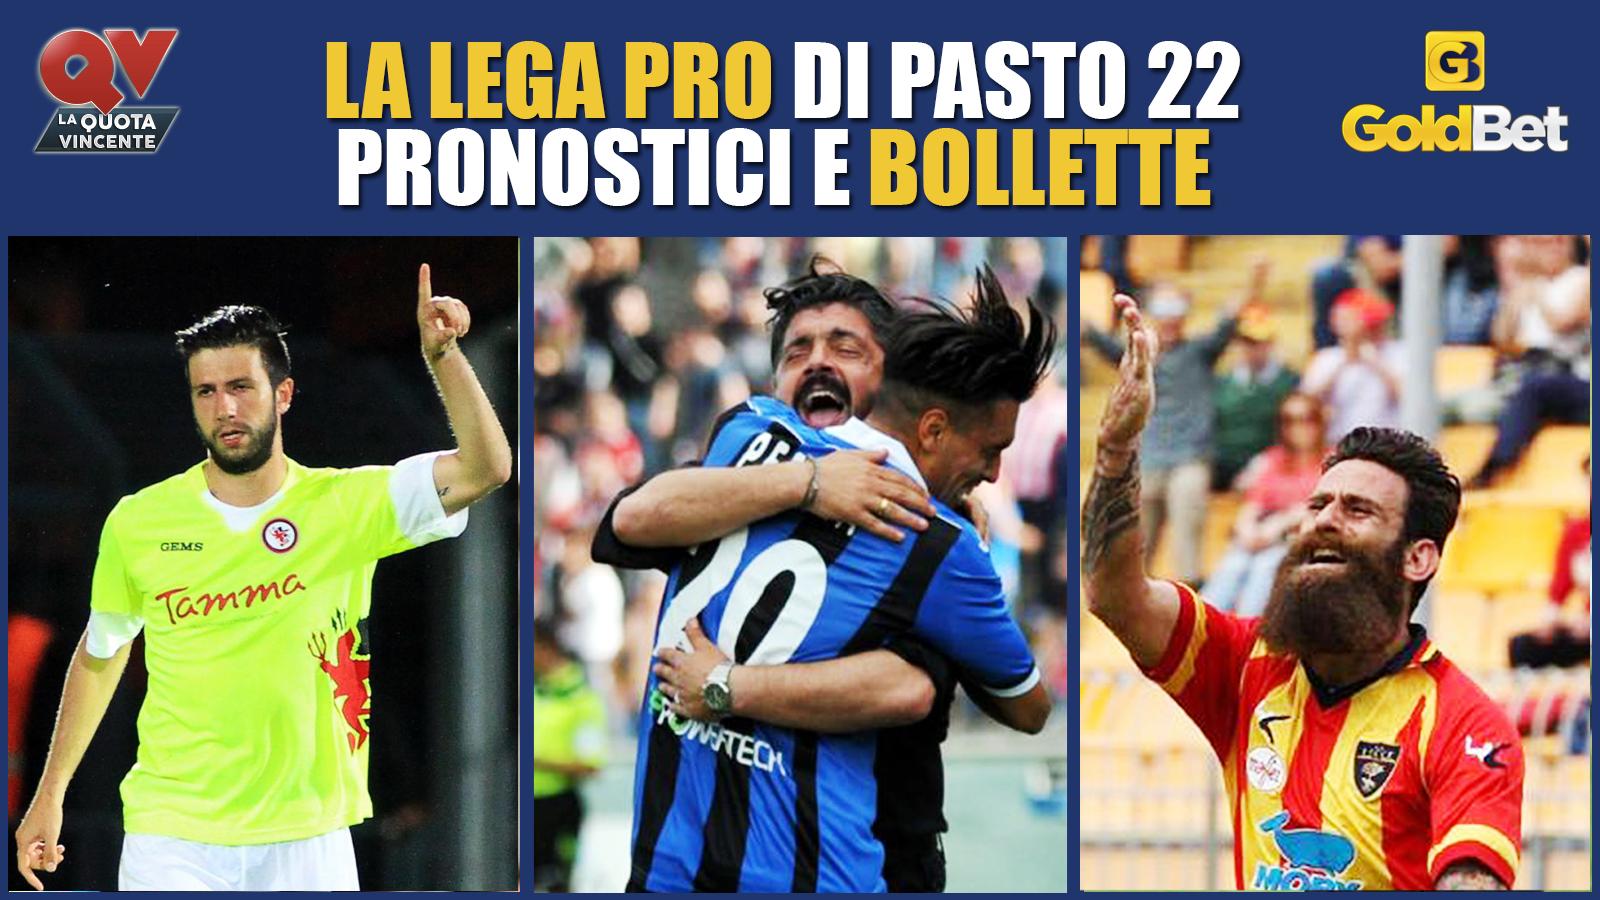 lega_pro_blog_qv_pasto_22_playoff_playout_supercoppa_esultanza_news_scommesse_bollette_cassa